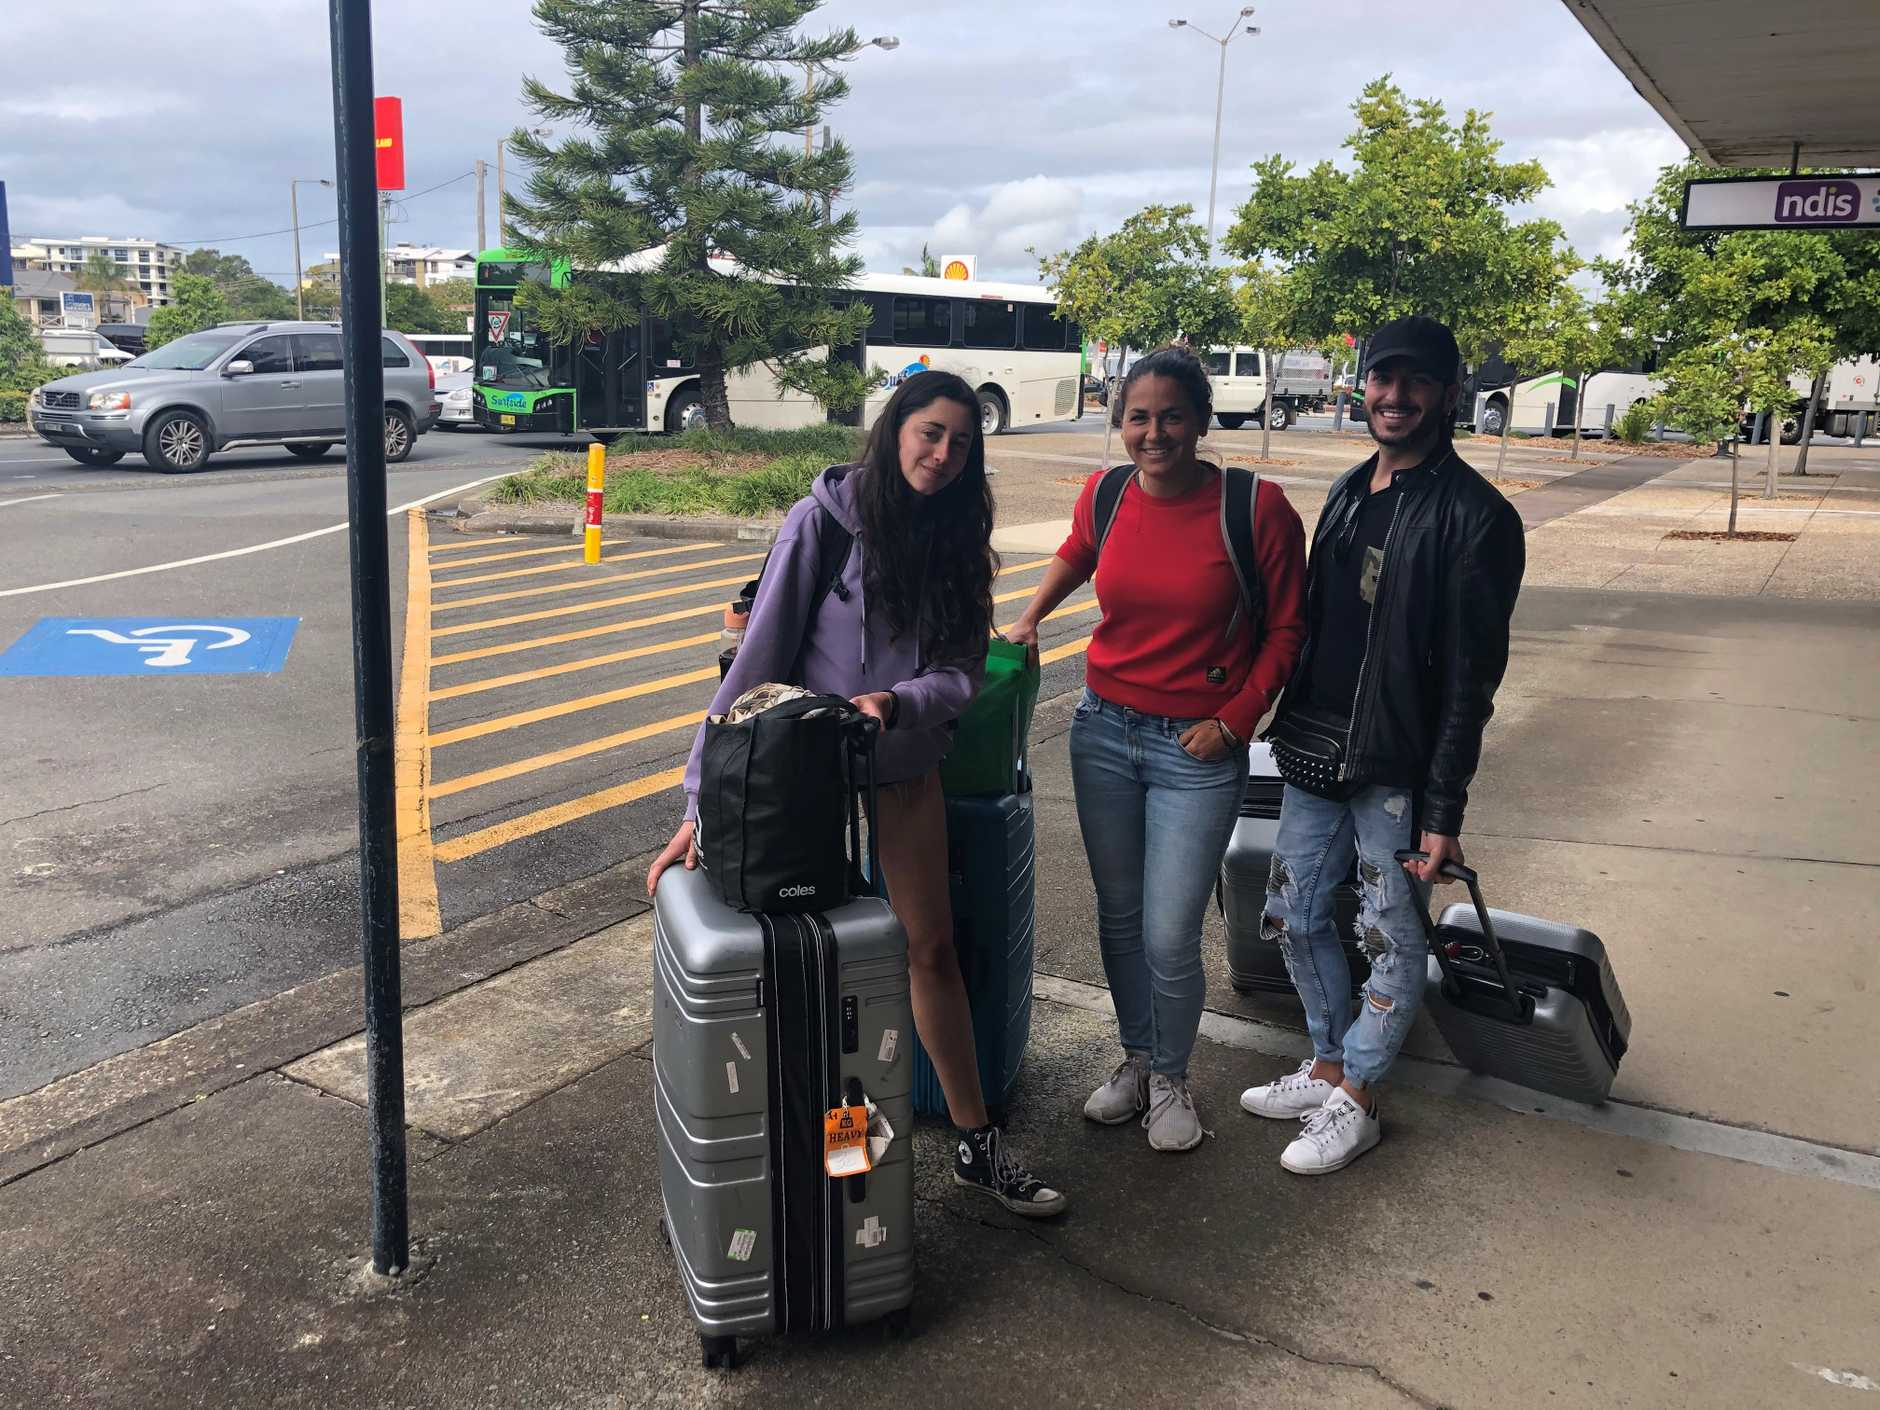 Italian backpackers Camille Bena, Miryam Biavaschi and Flavio Perrino are waiting to cross the Queensland border.